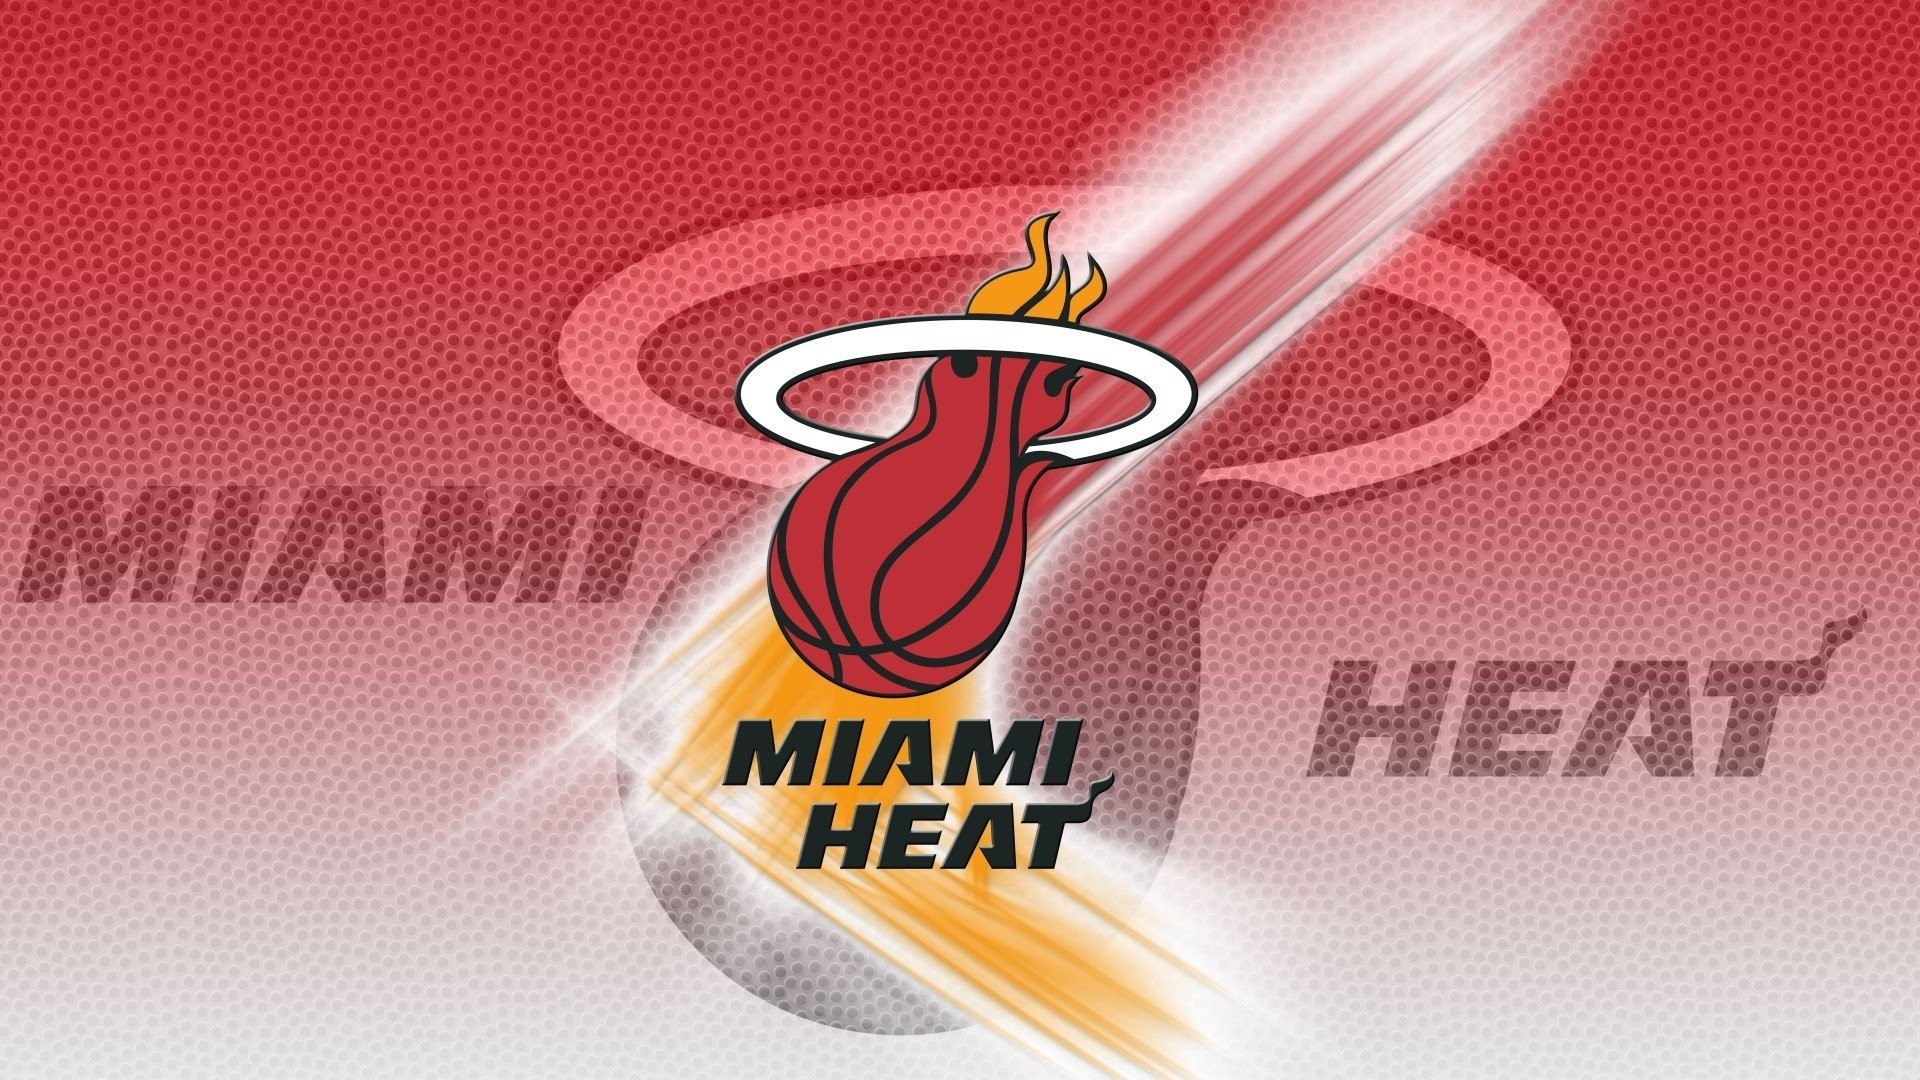 Miami Heat hd desktop wallpaper